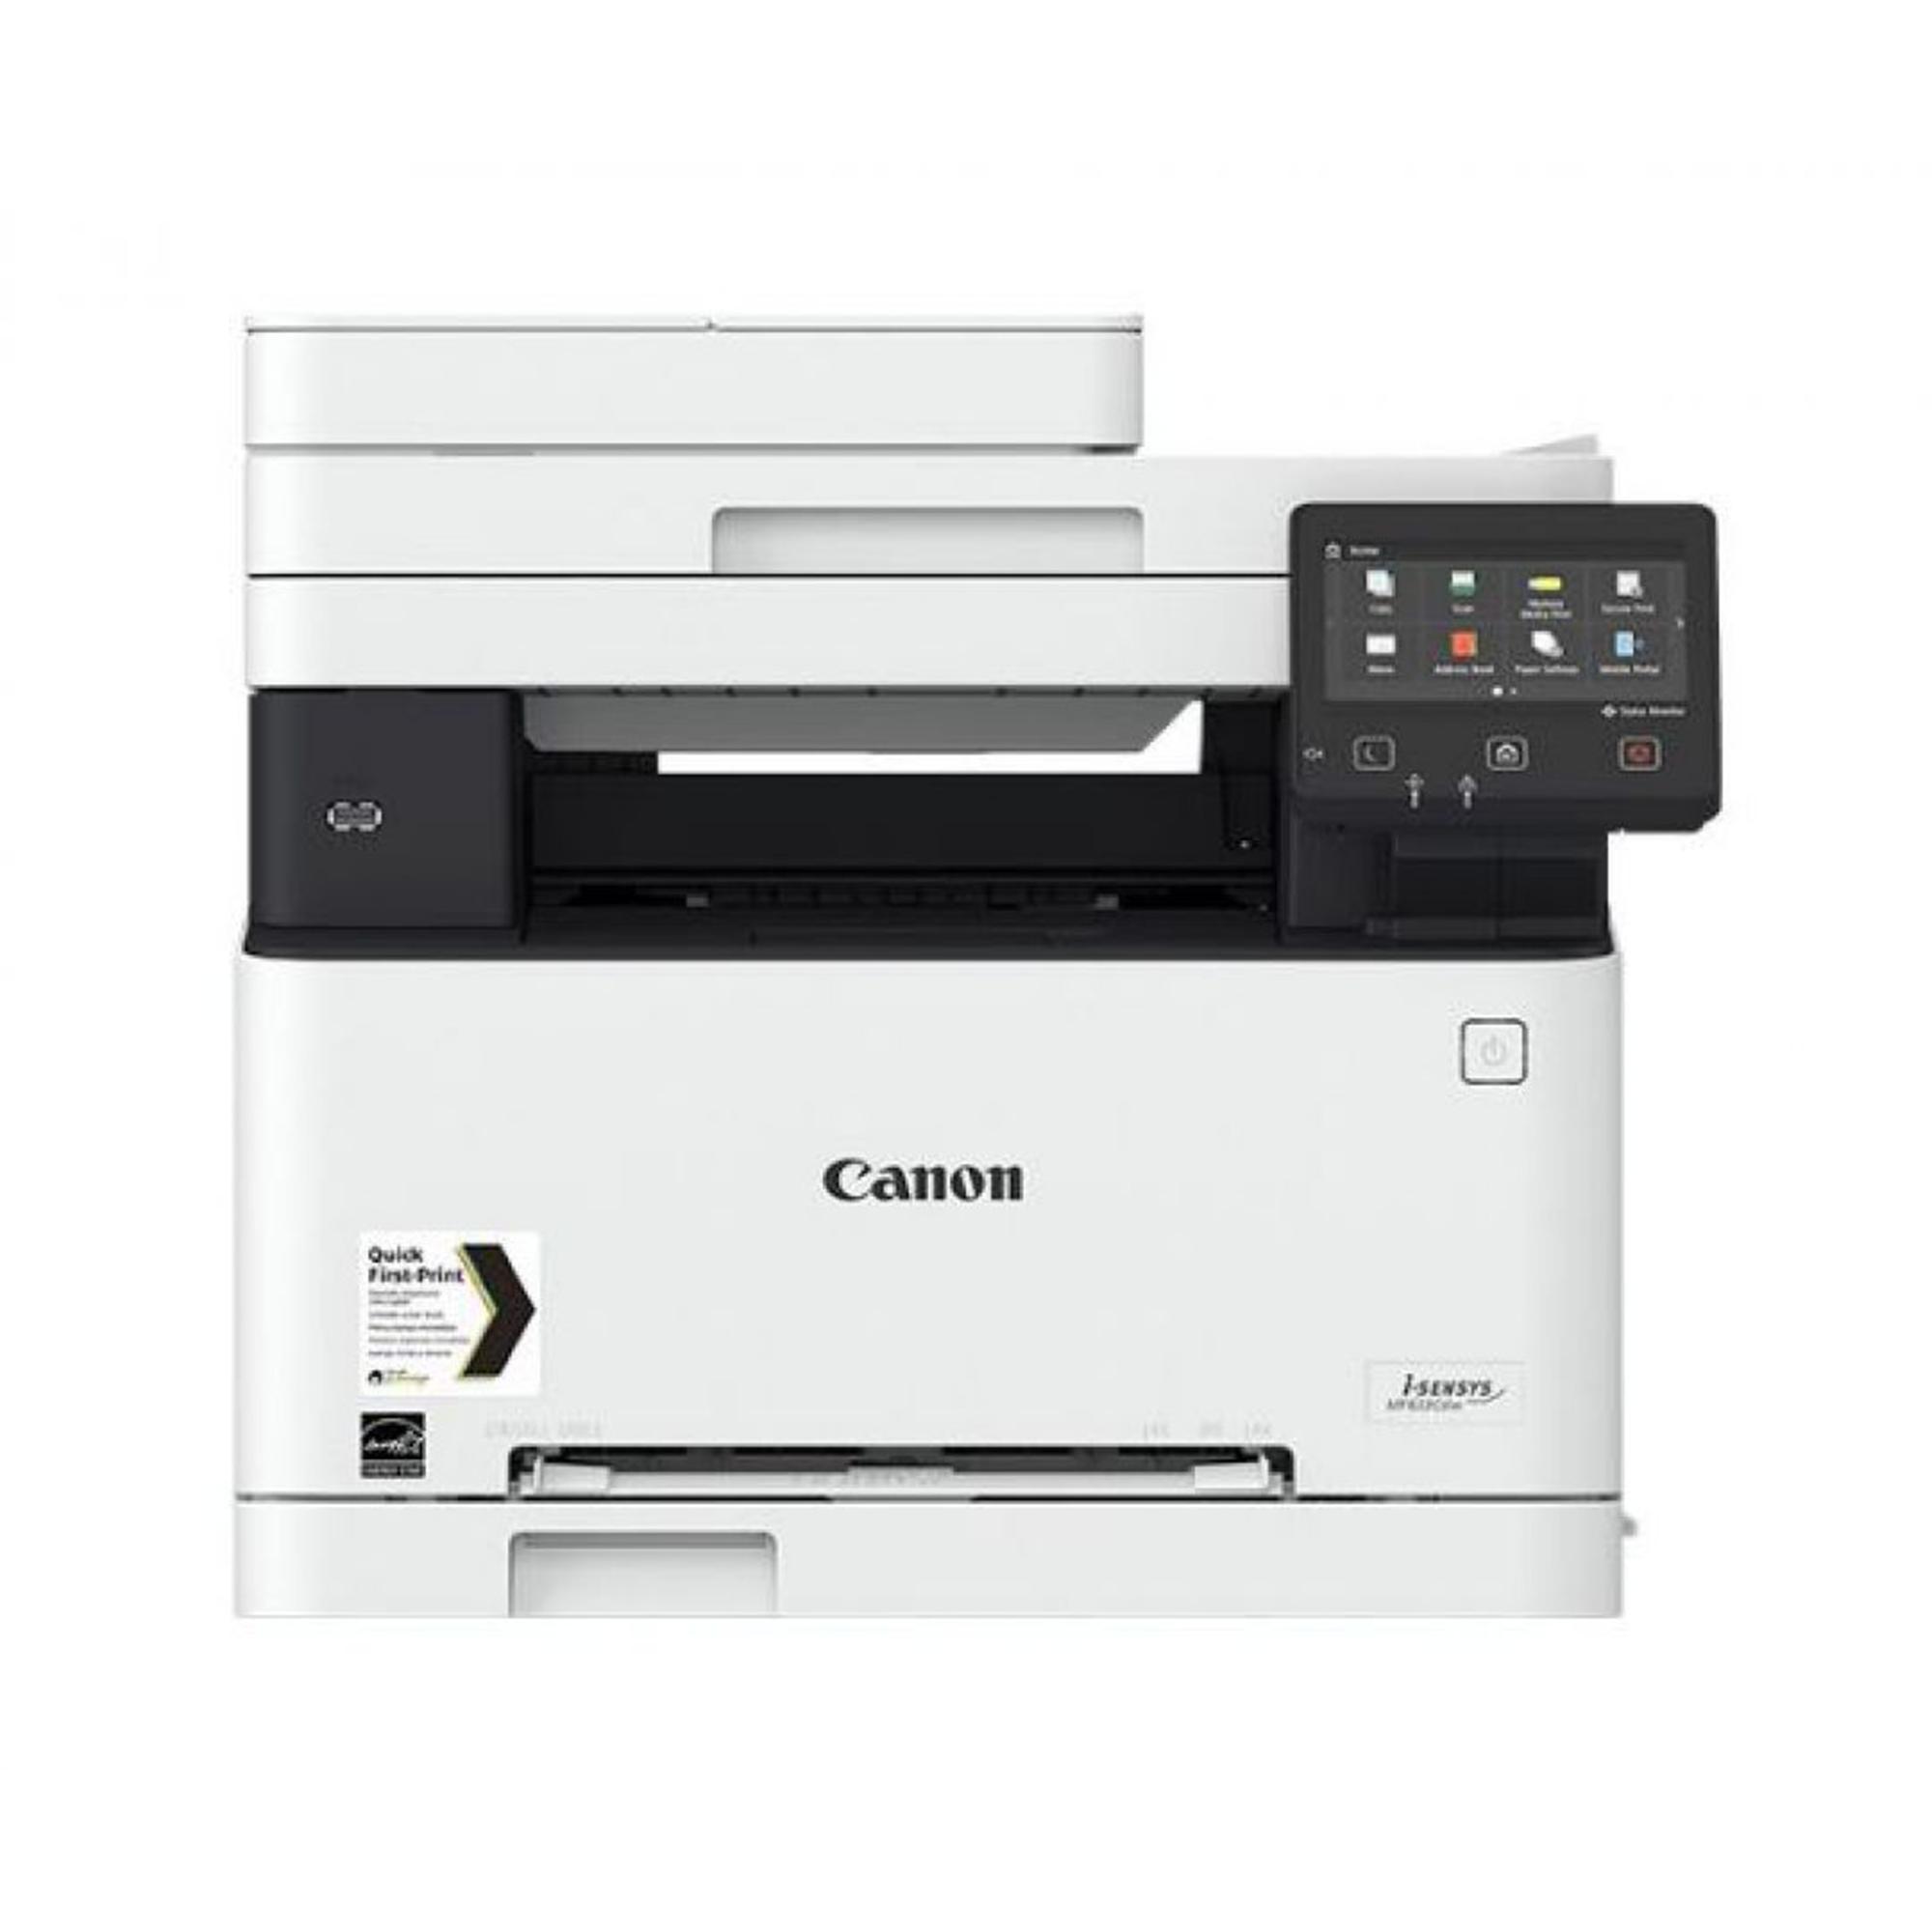 Canon i-SENSYS MF 633 Cdw Printer + A4 COPY PAPER FREE GIFT